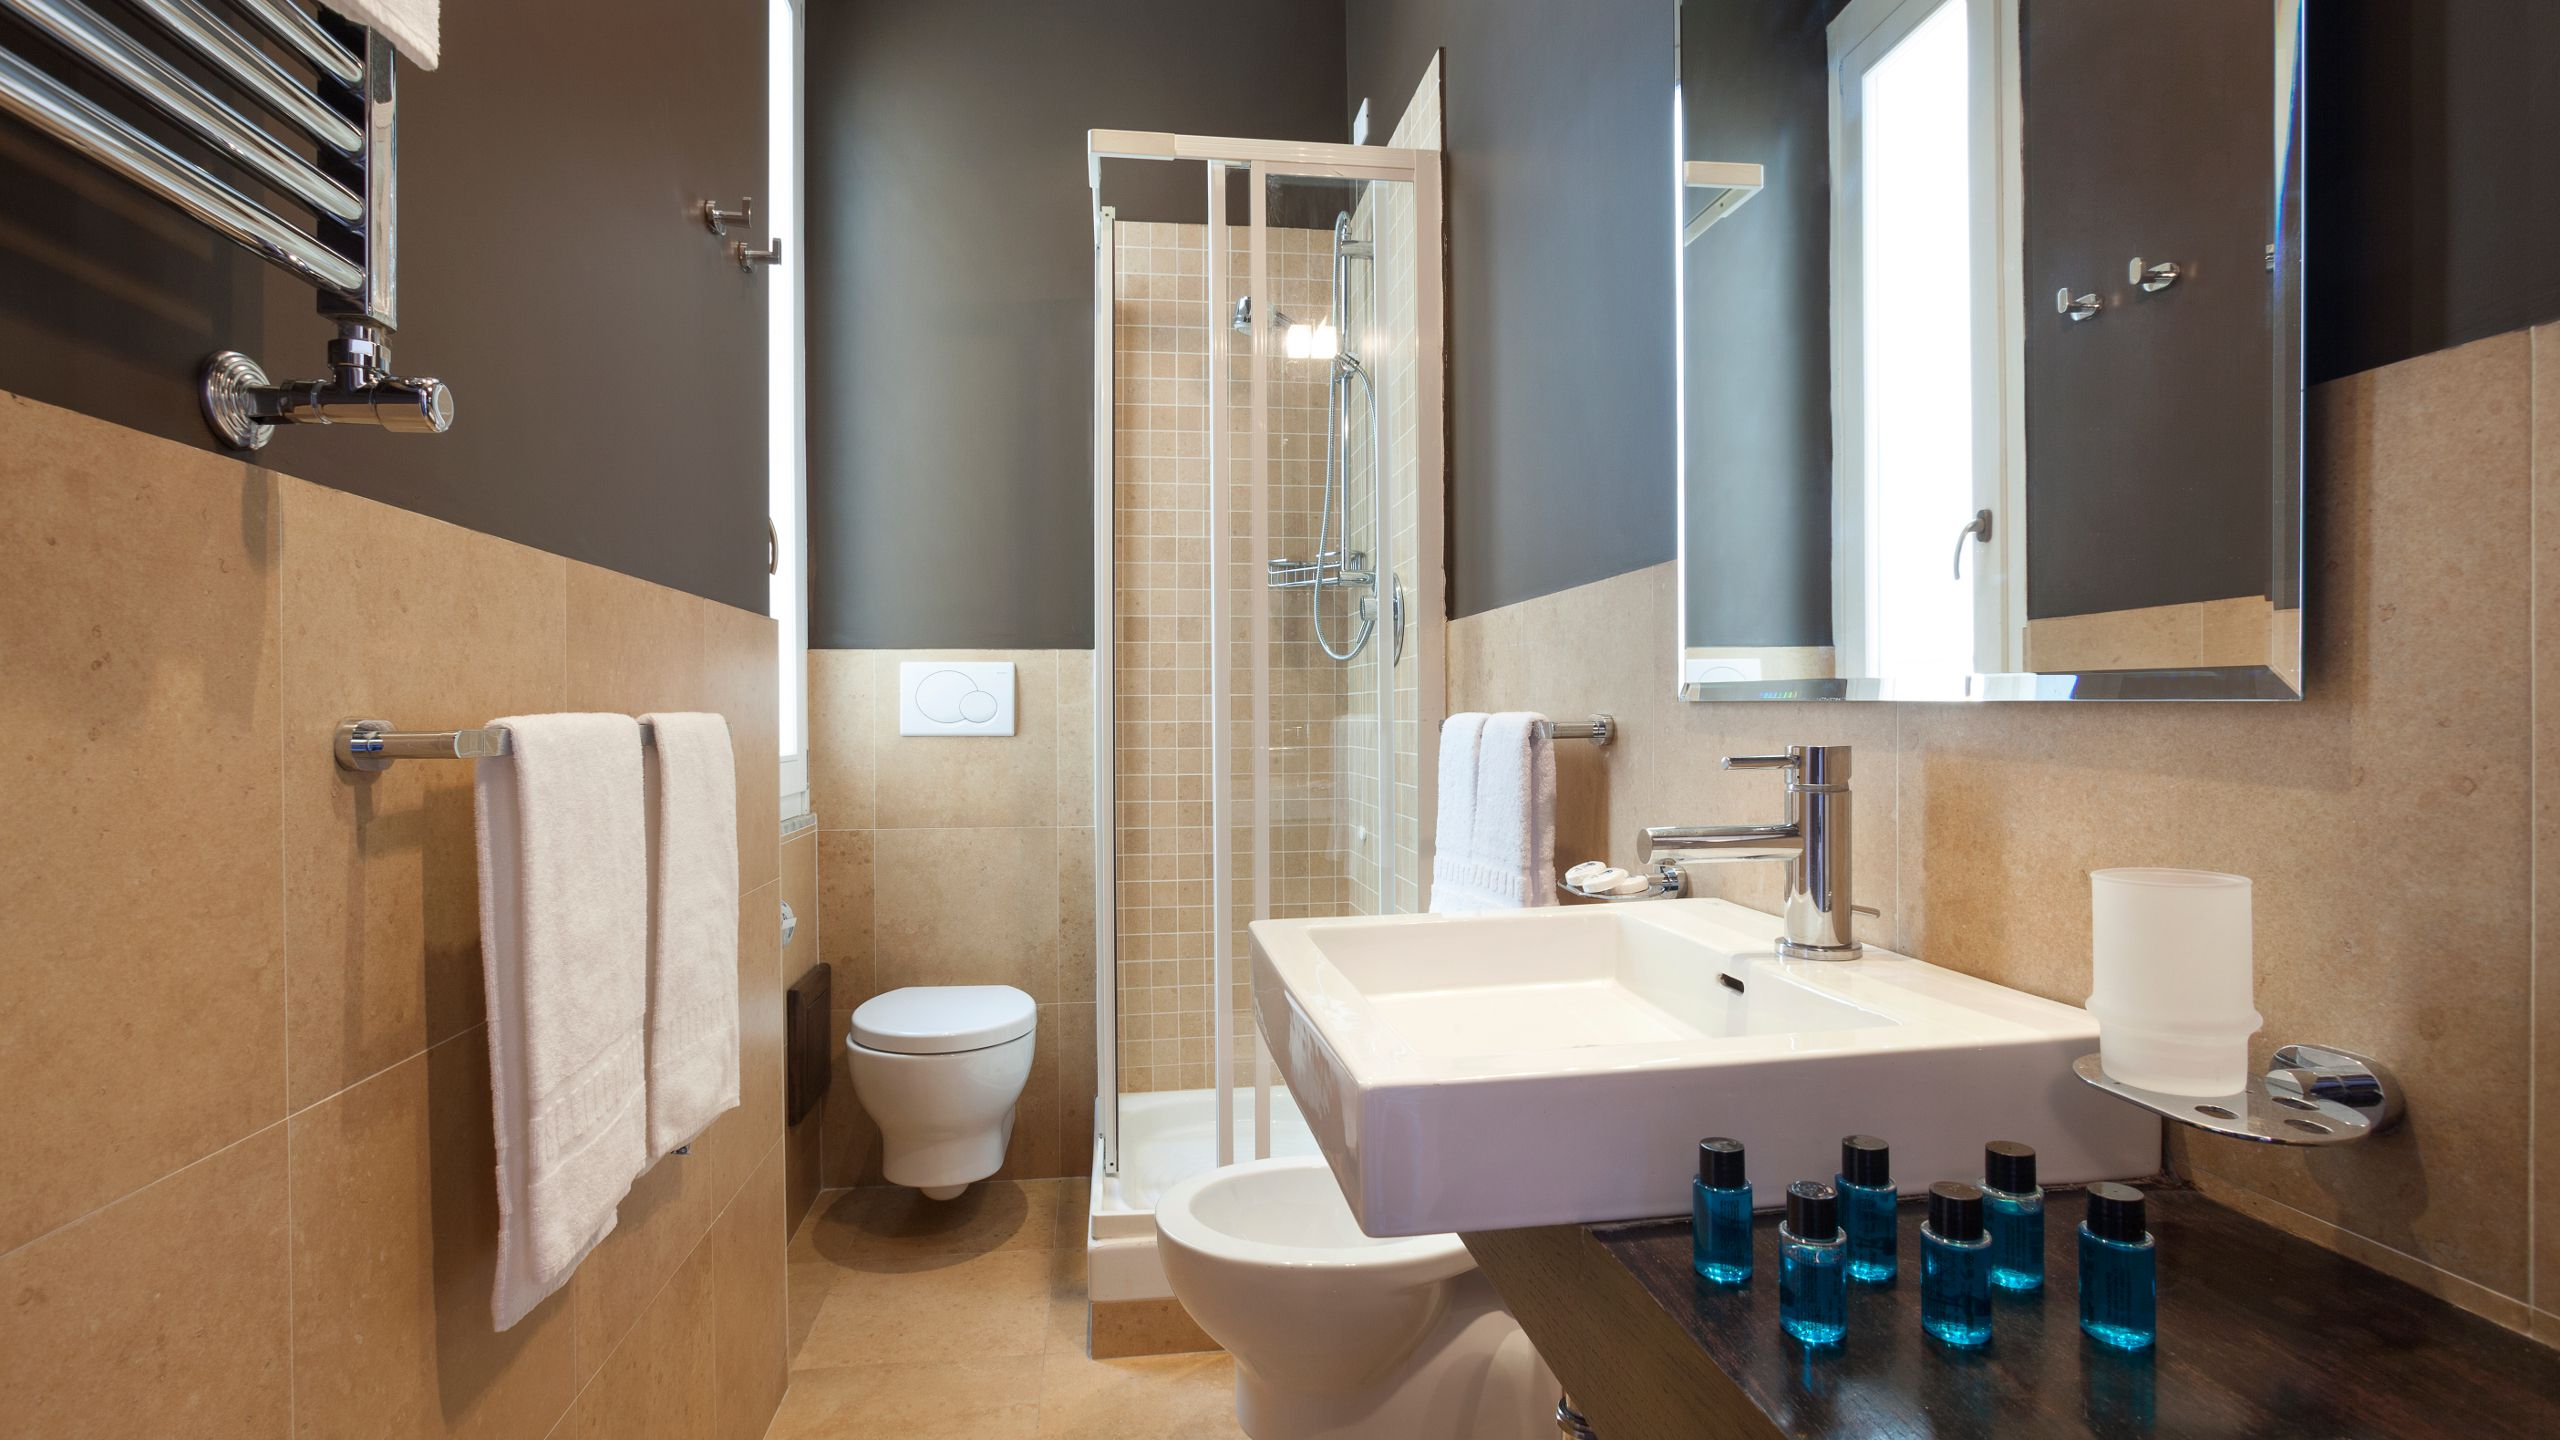 residence-trianon-roma-appartamenti-A24_020_(7141)_AltaRis.jpg